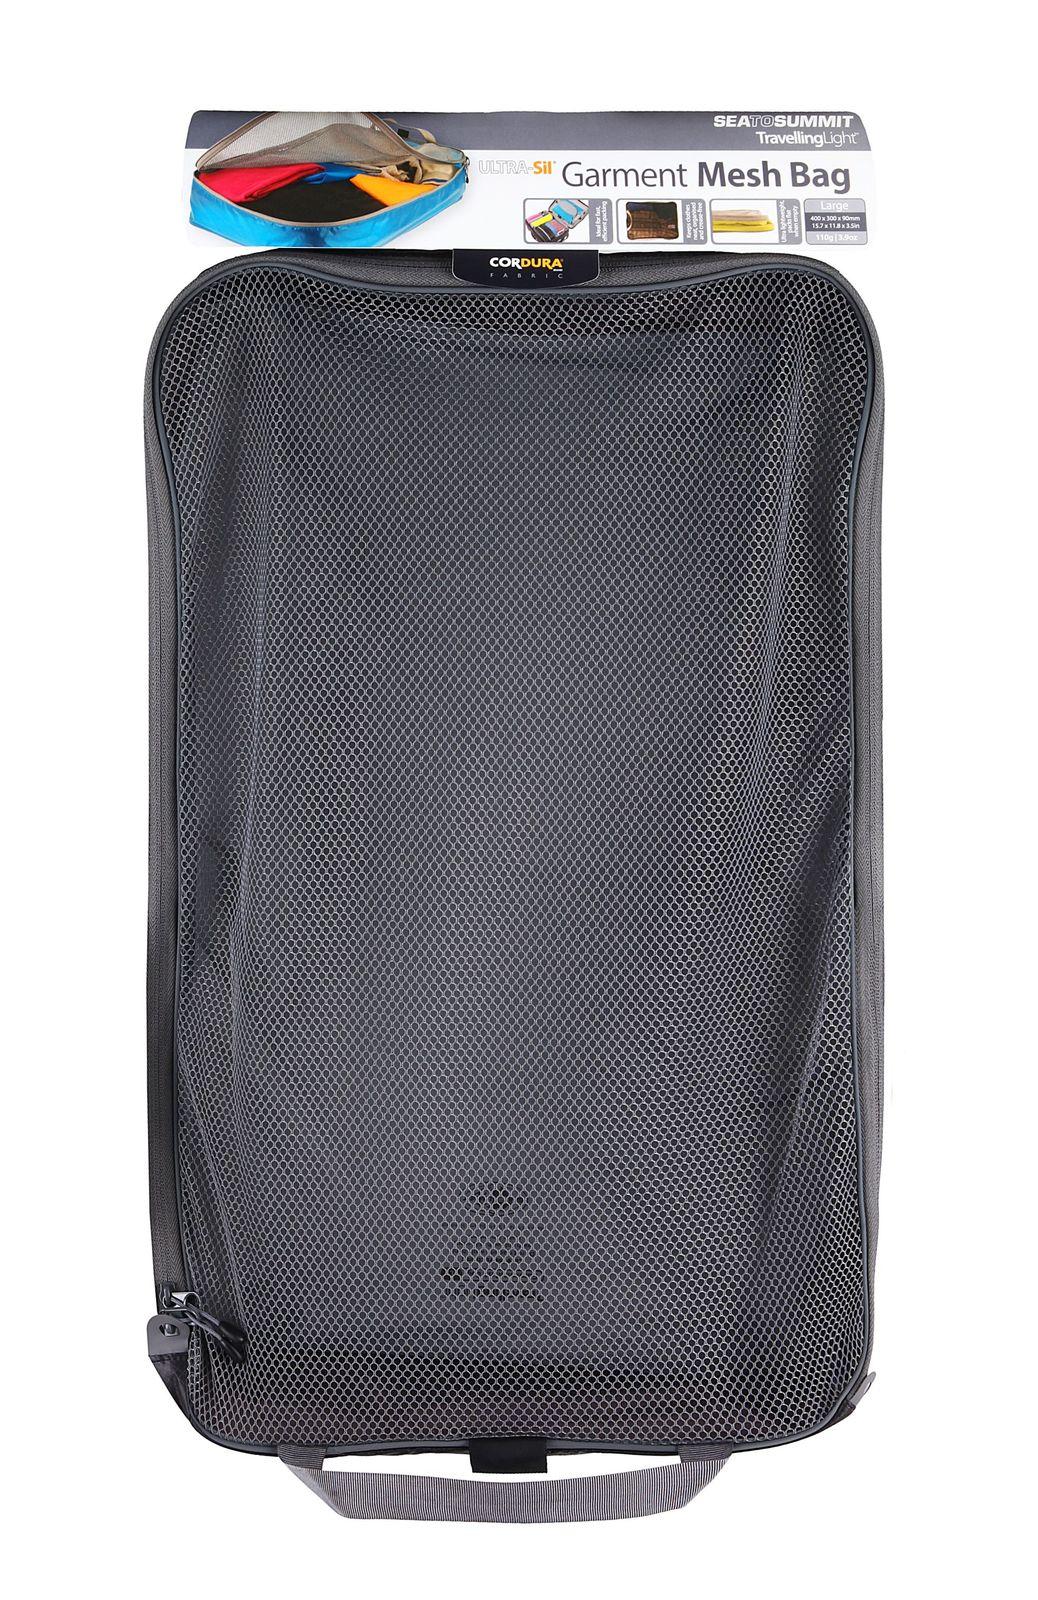 Sea To Summit TravellingLight Garment Mesh Bag Large Black / Grey